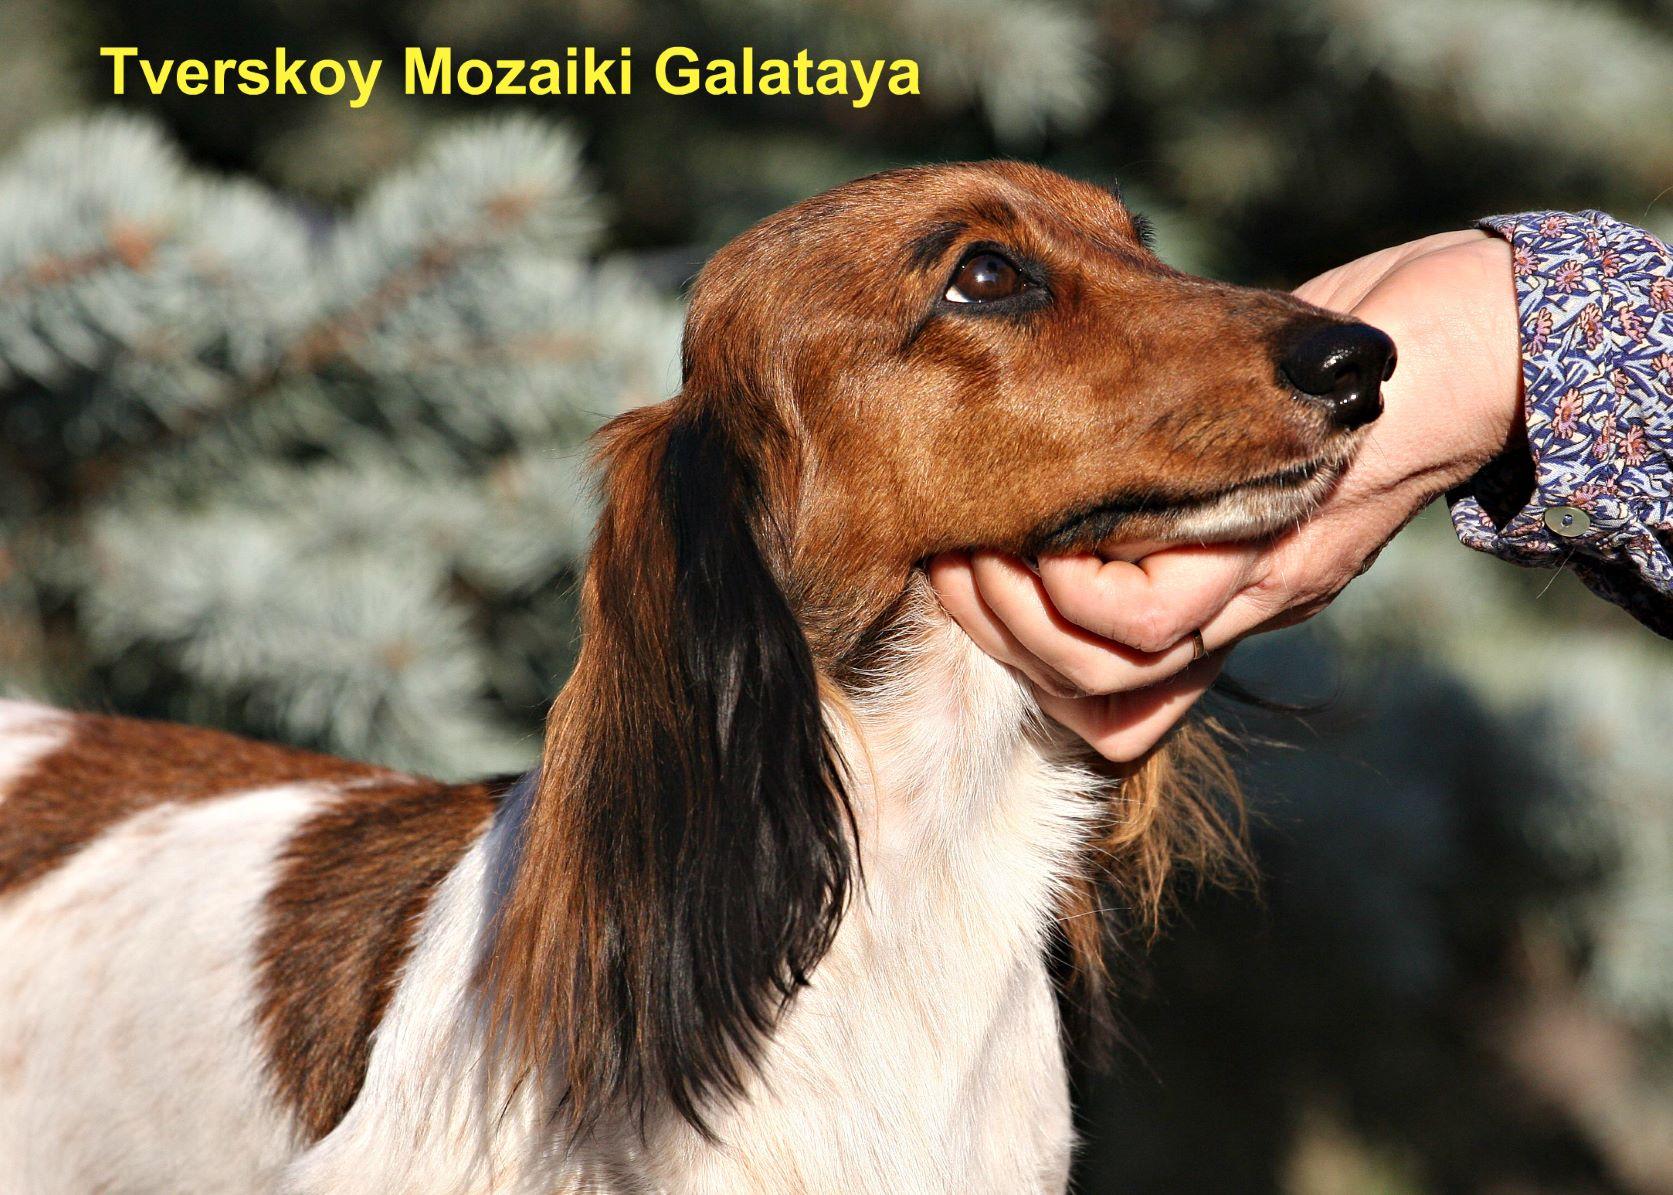 Tverskoj Mozaiki Galateya